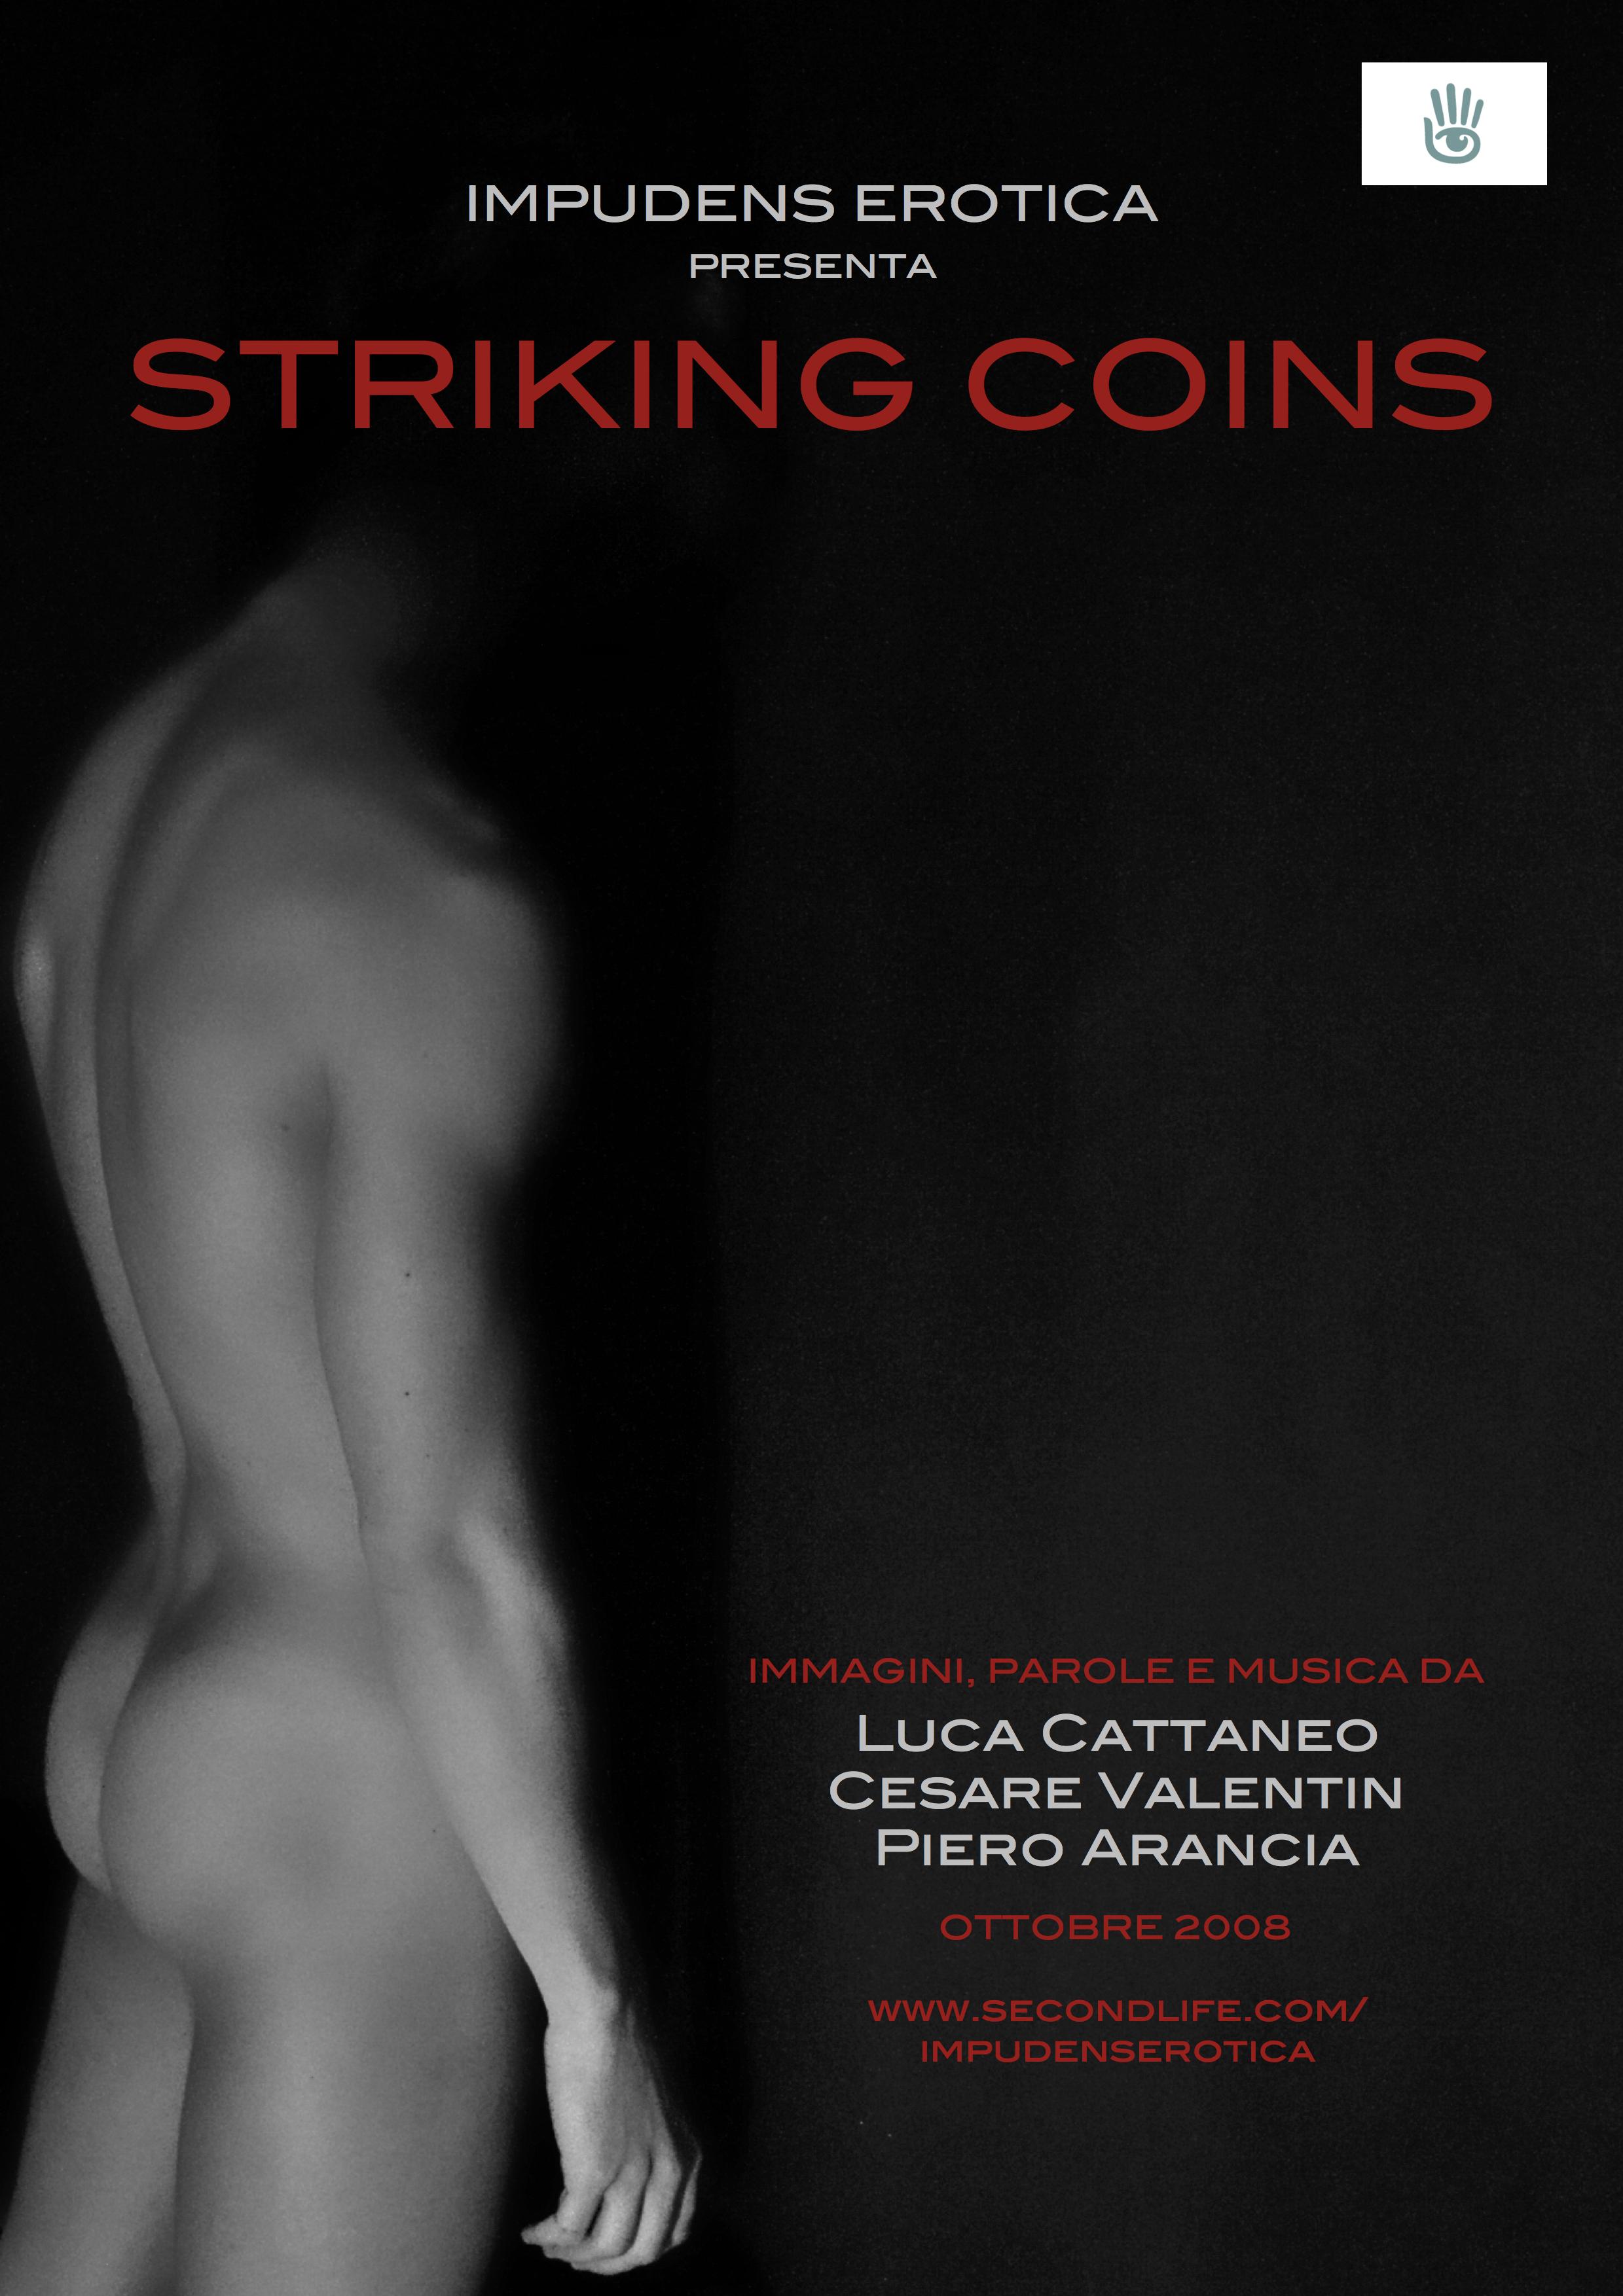 Striking Coins 2008